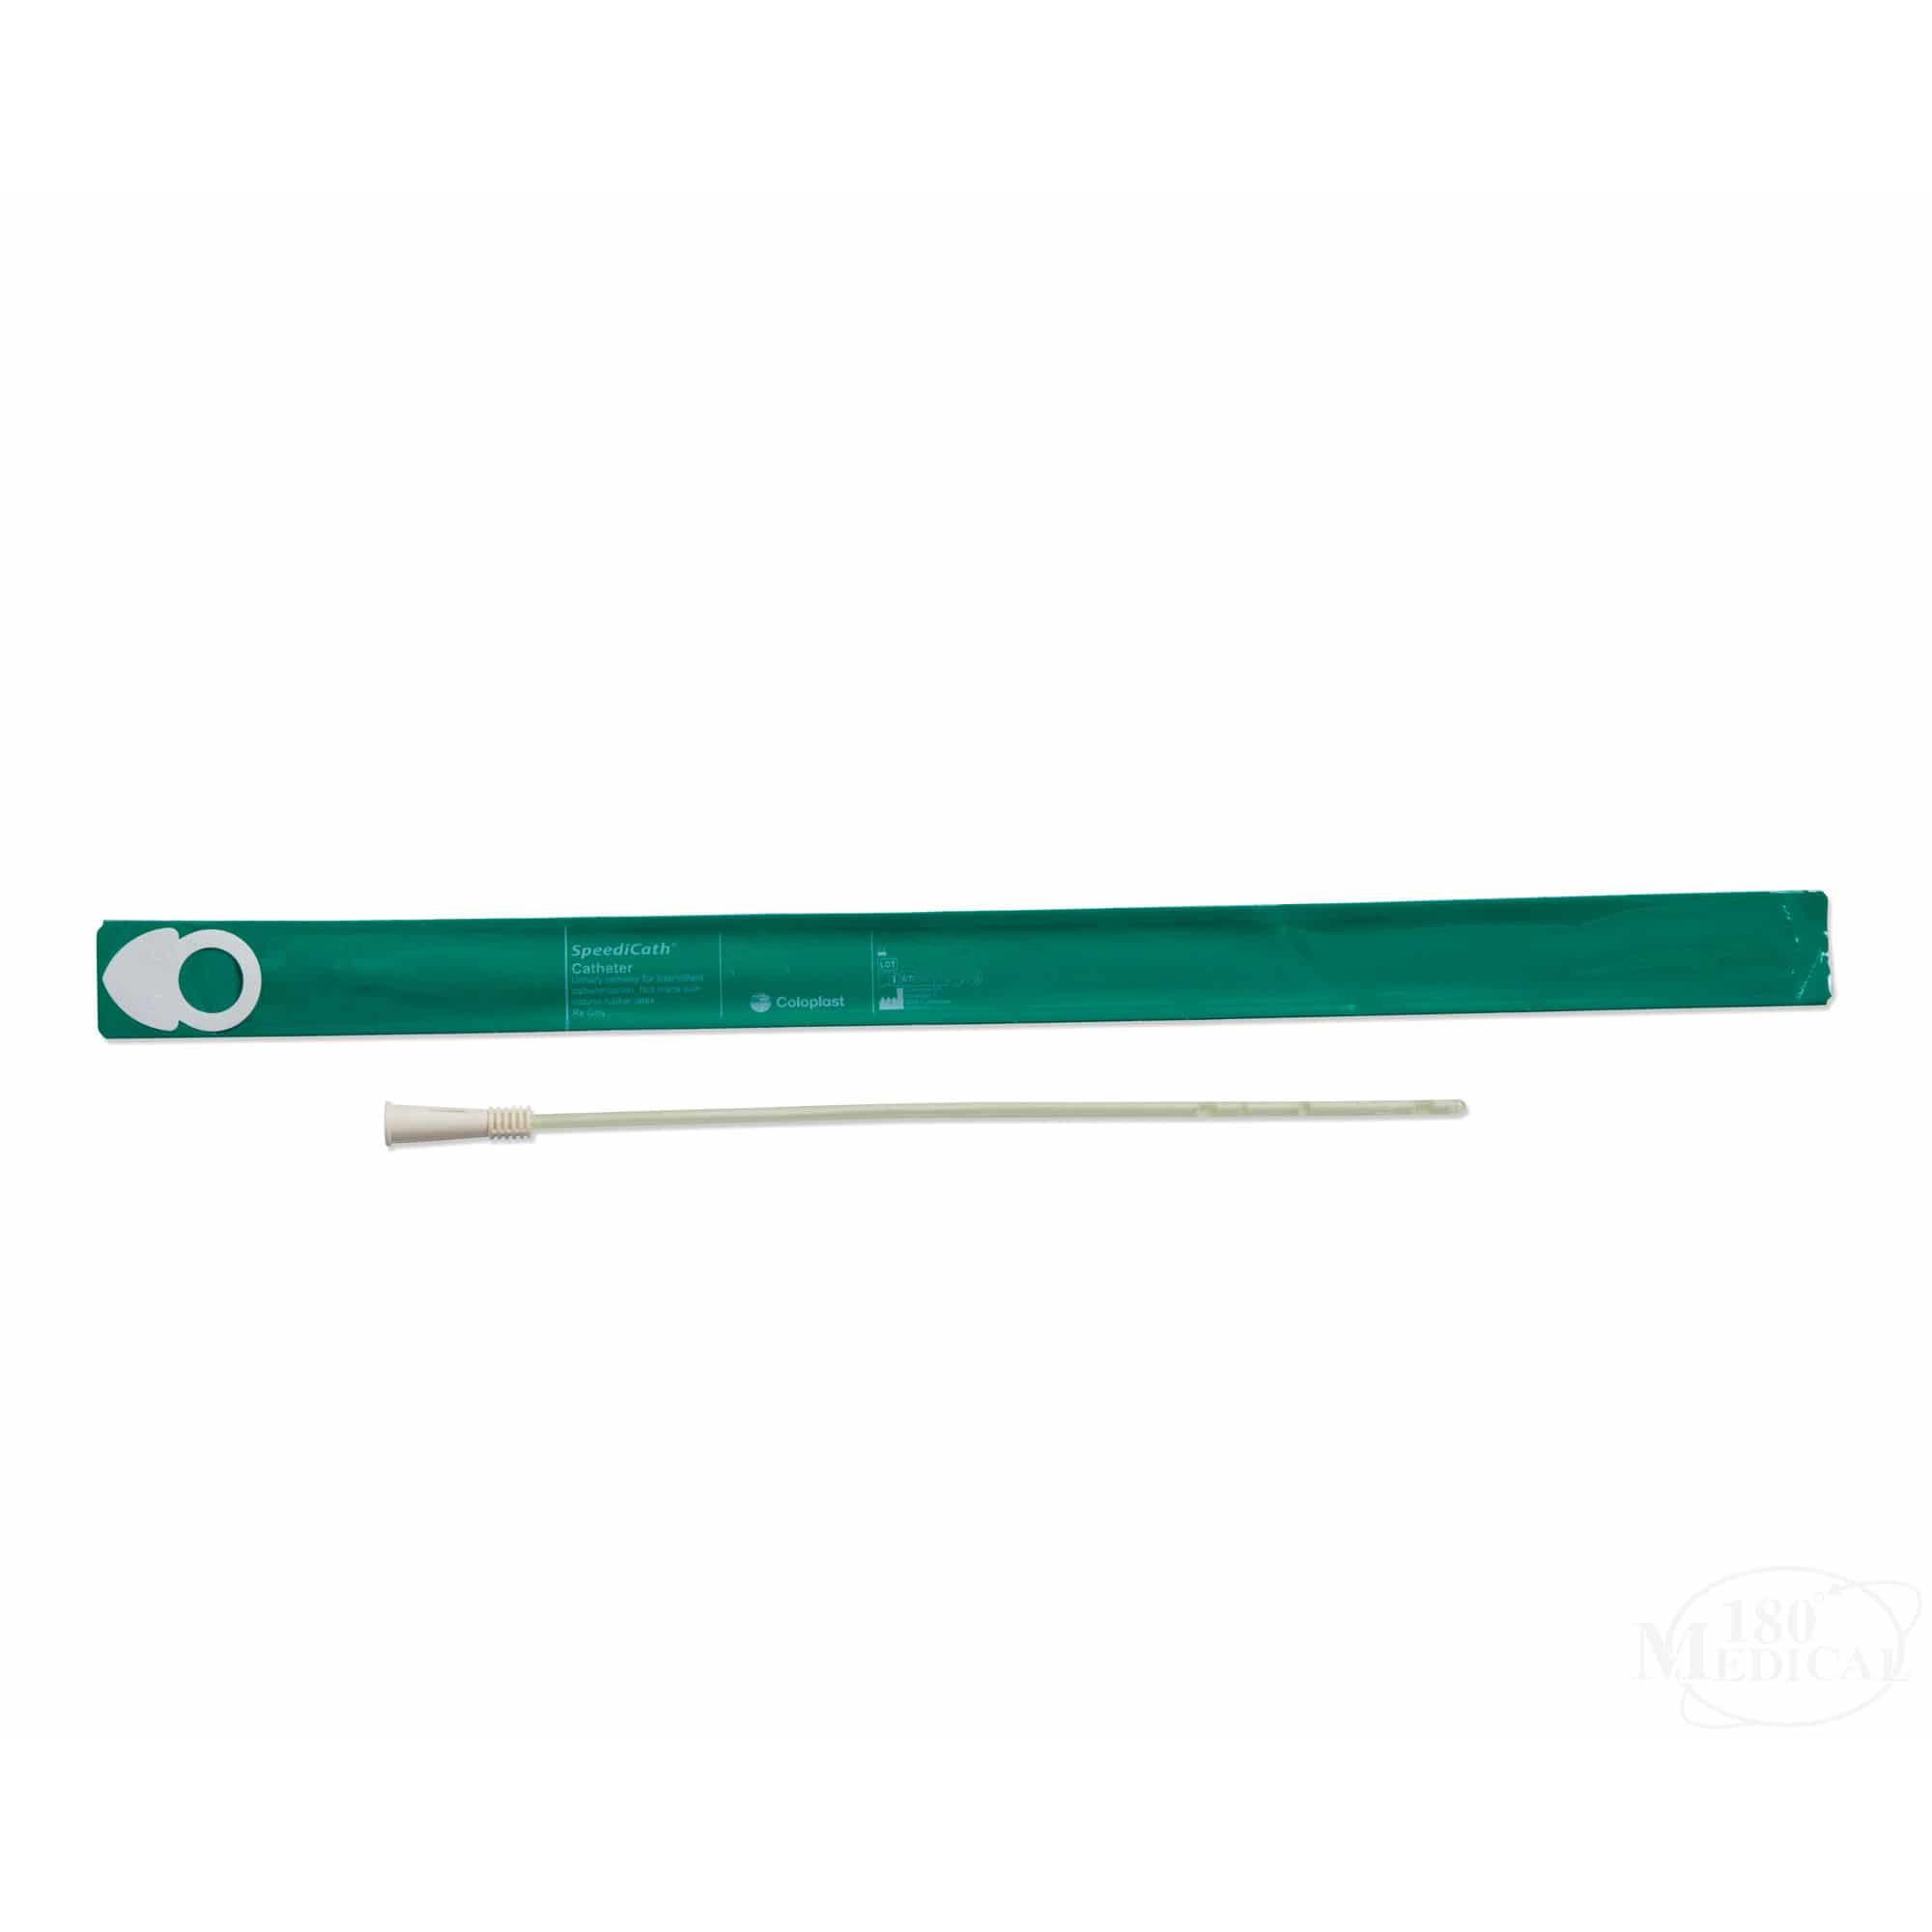 "Coloplast SpeediCath Pediatric Catheter,Straight,Hydrophilic Coating,Sterile,PVC 12Fr, 10"" L"